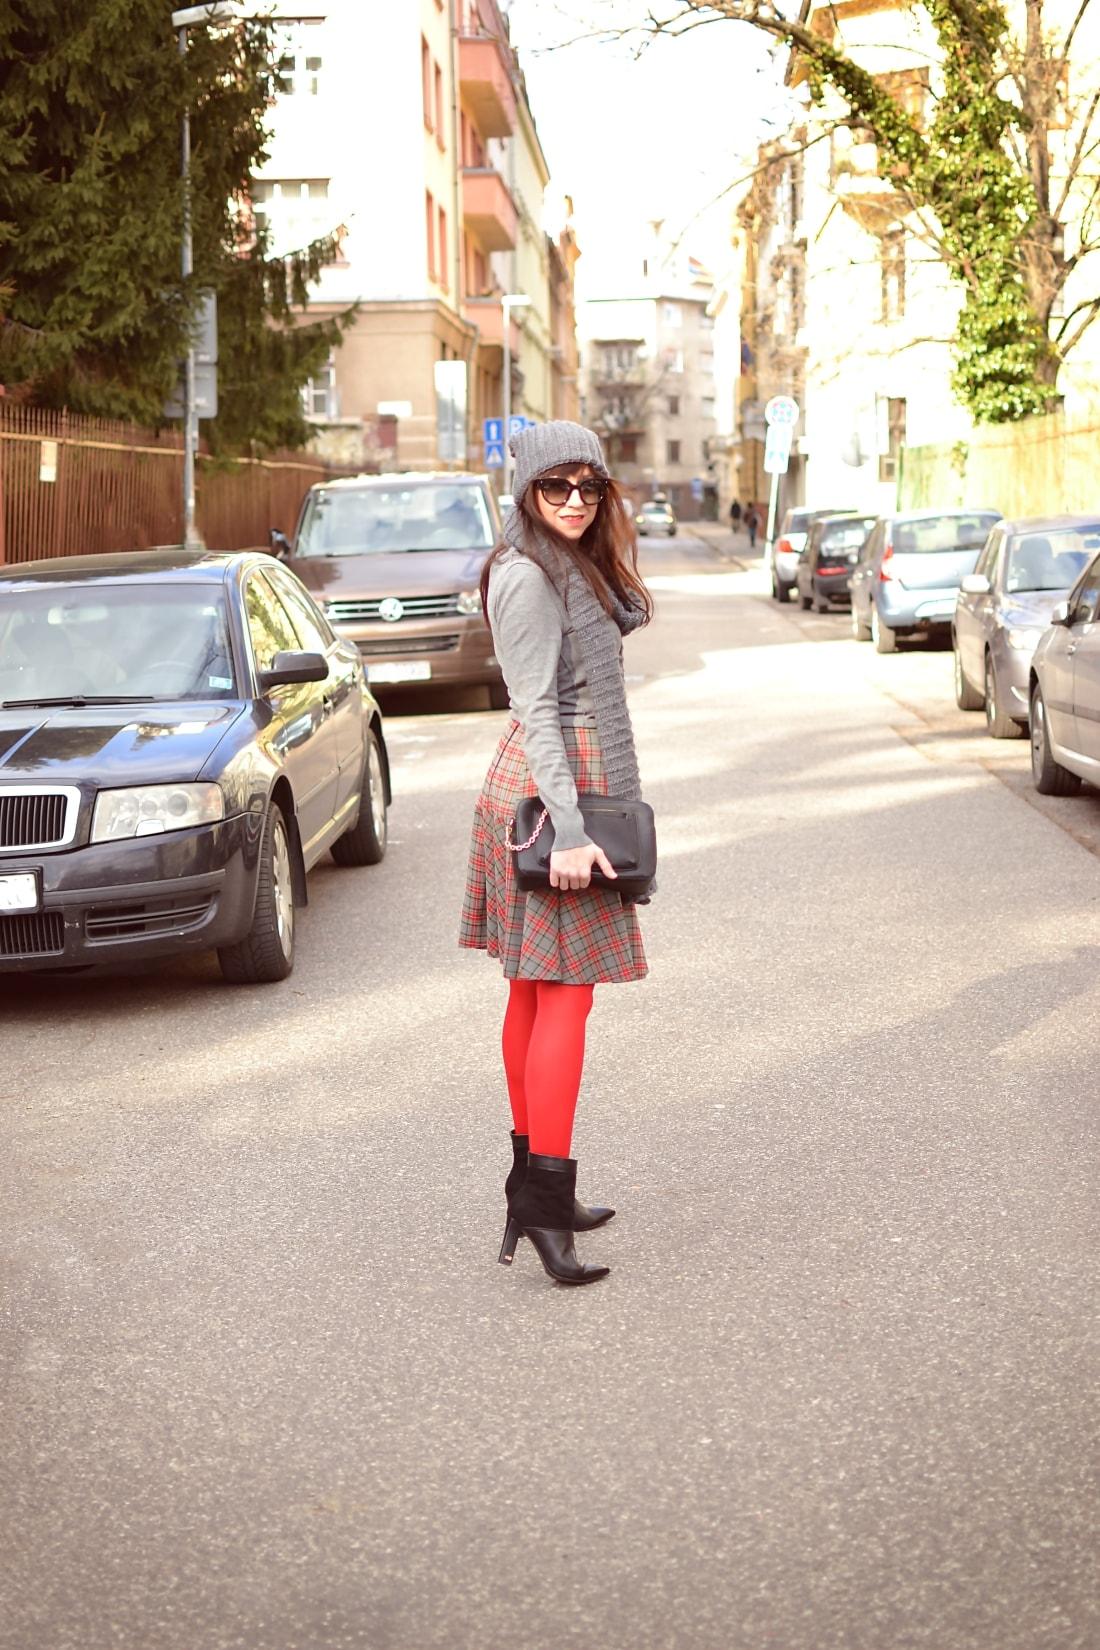 Červená_Katharine-fashion is beautiful_blog 10_Červené pančuchy_Červený kabát_Károvaná sukňa_Katarína Jakubčová_Fashion blogger_Outfit